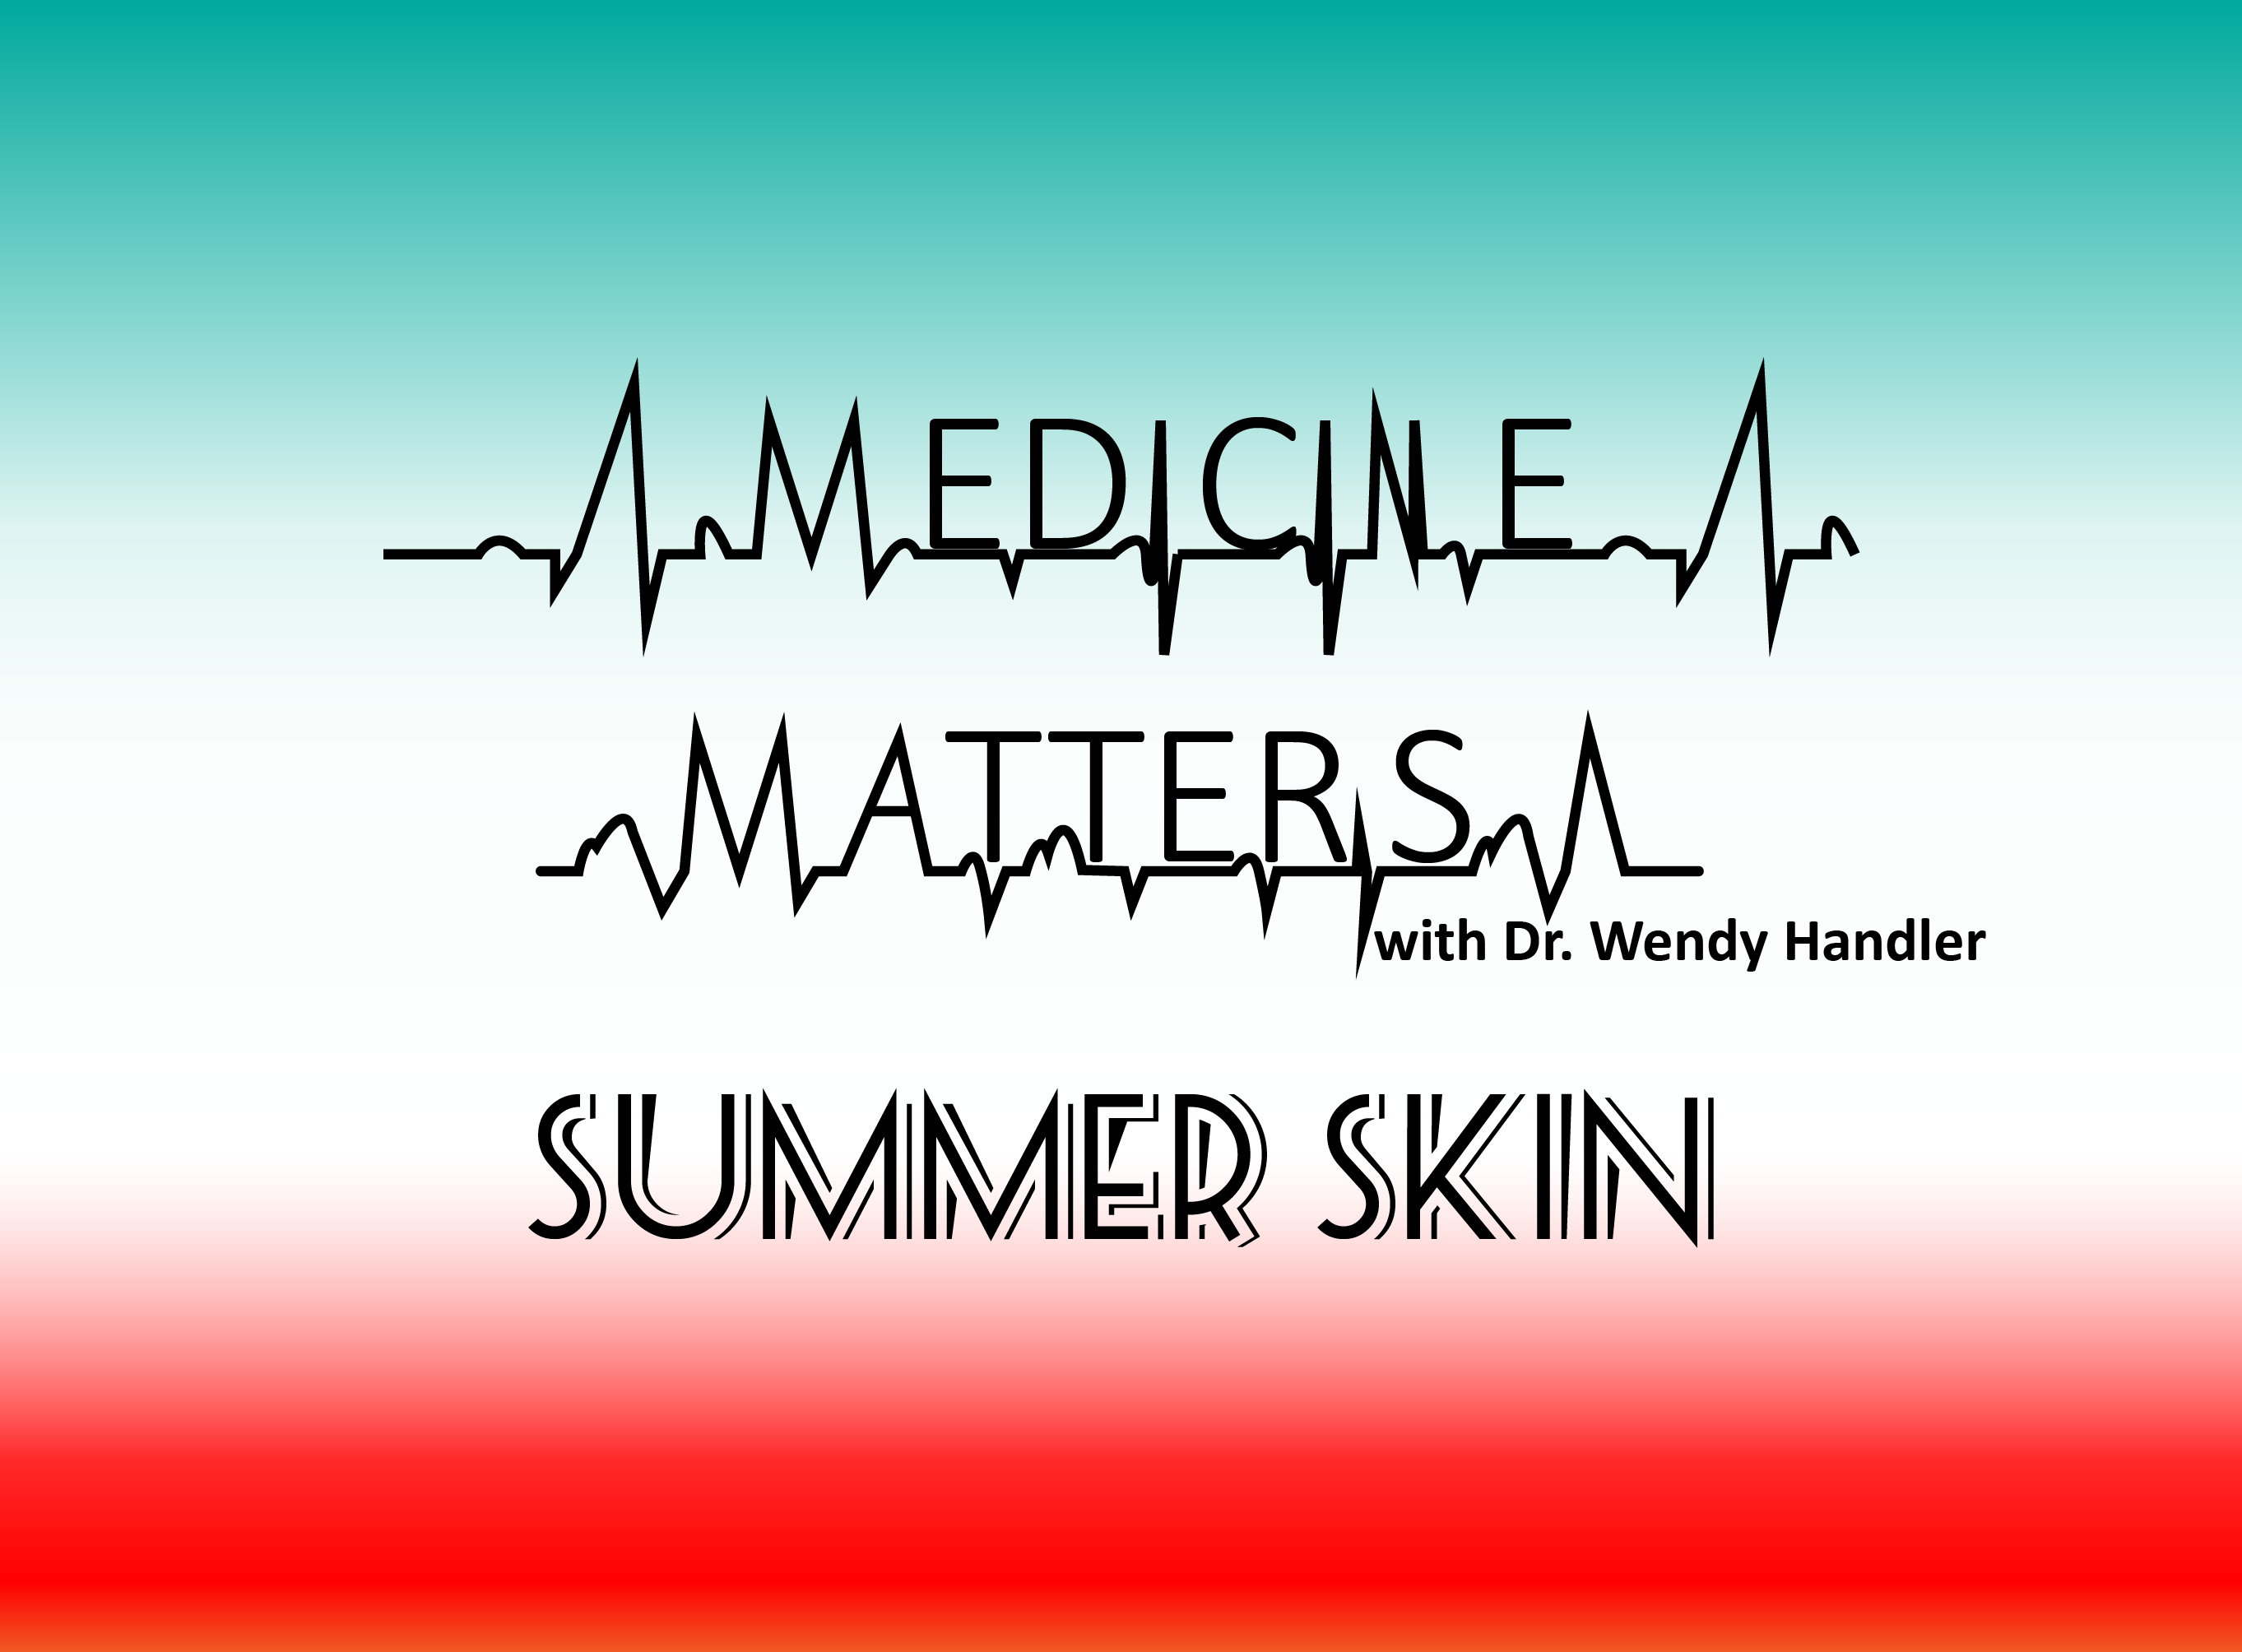 Medicine Matters Summer Skin